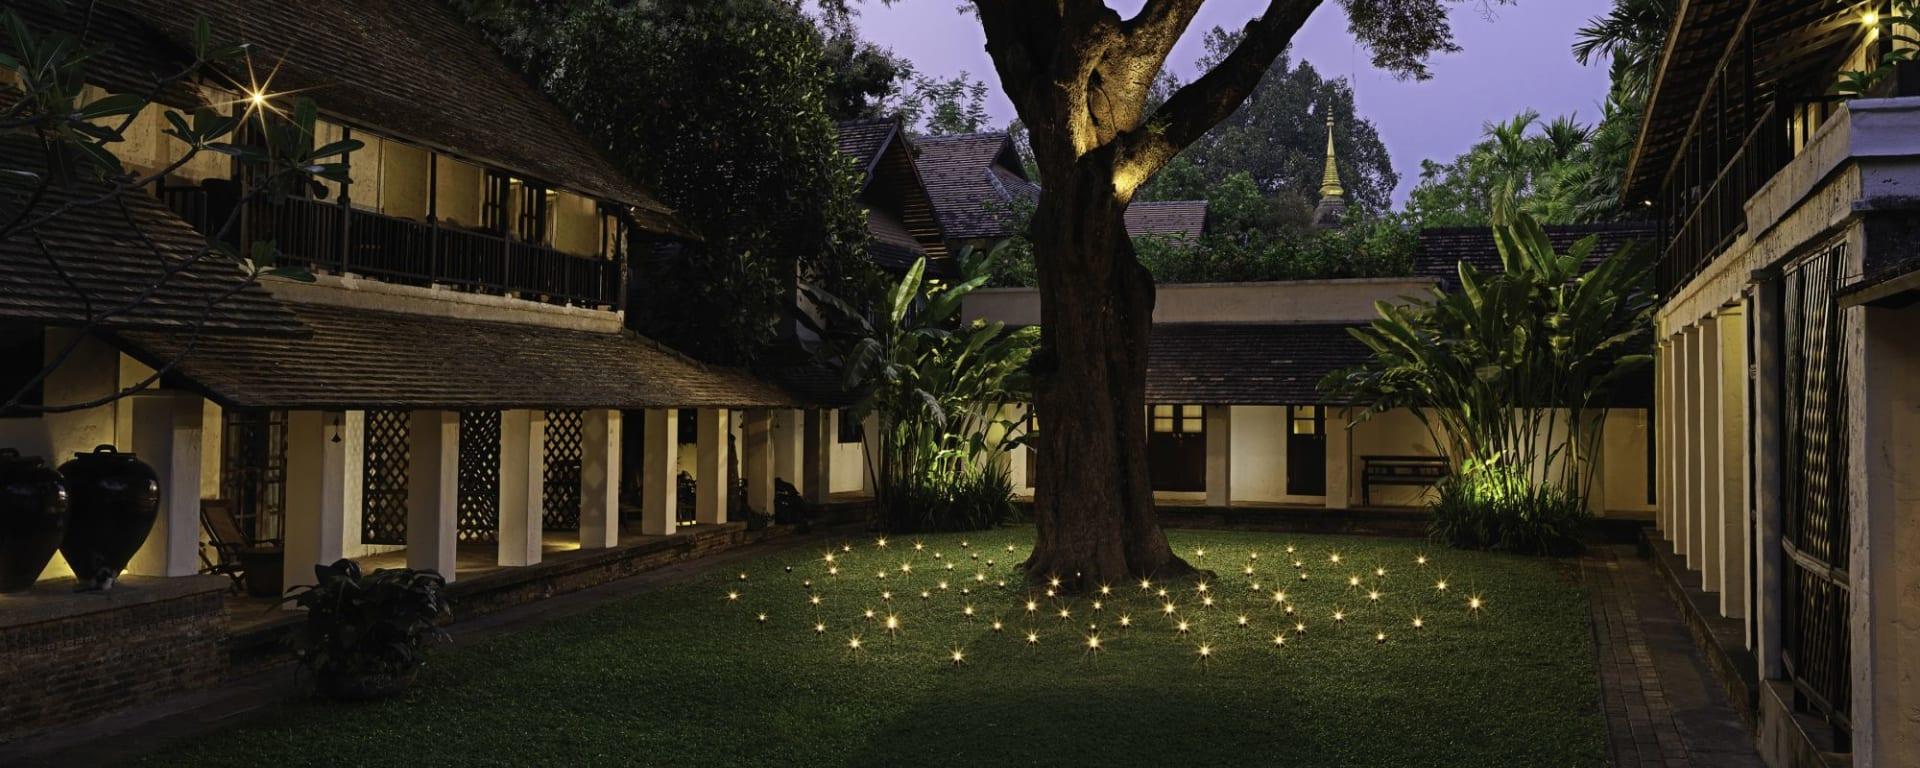 Tamarind Village à Chiang Mai: Peaceful Tamarind Courtyard (Evening)